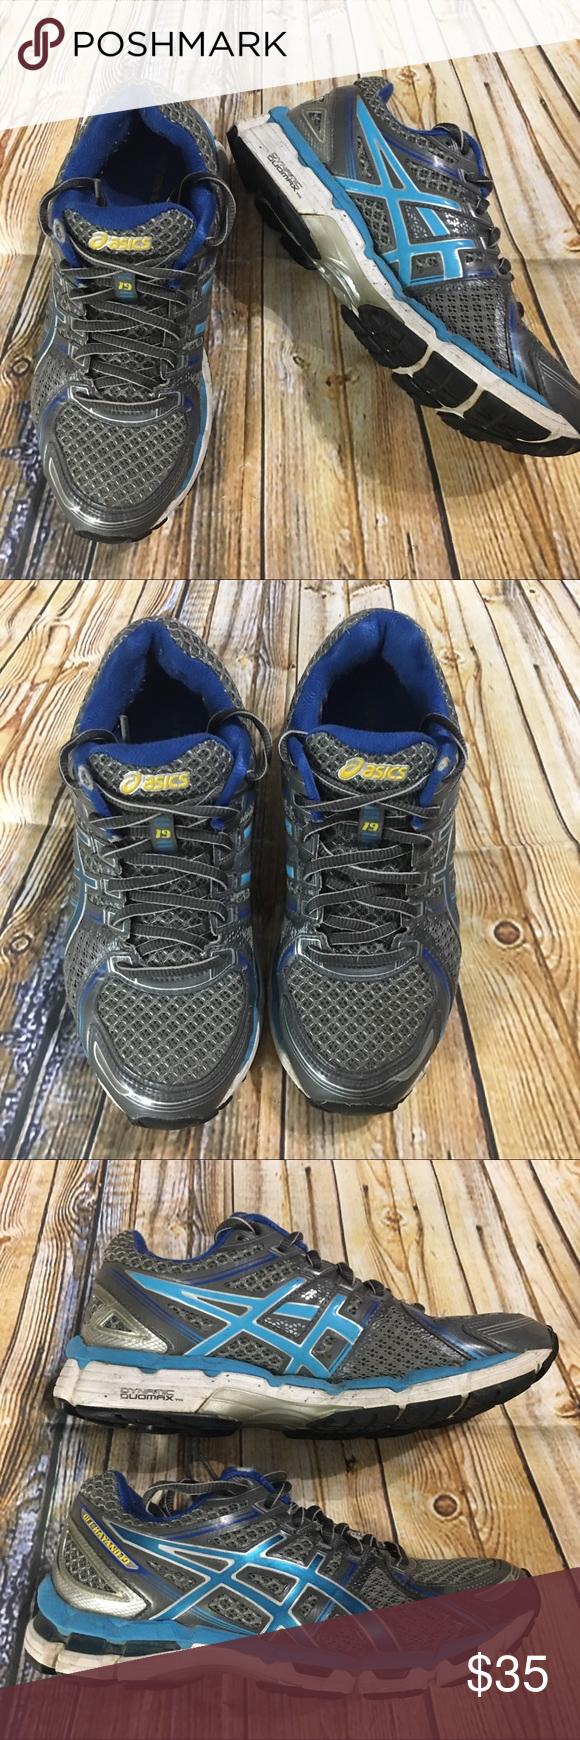 Asics Gel Kayano 19 Running Shoes Women's Size 6.5   Womens ...